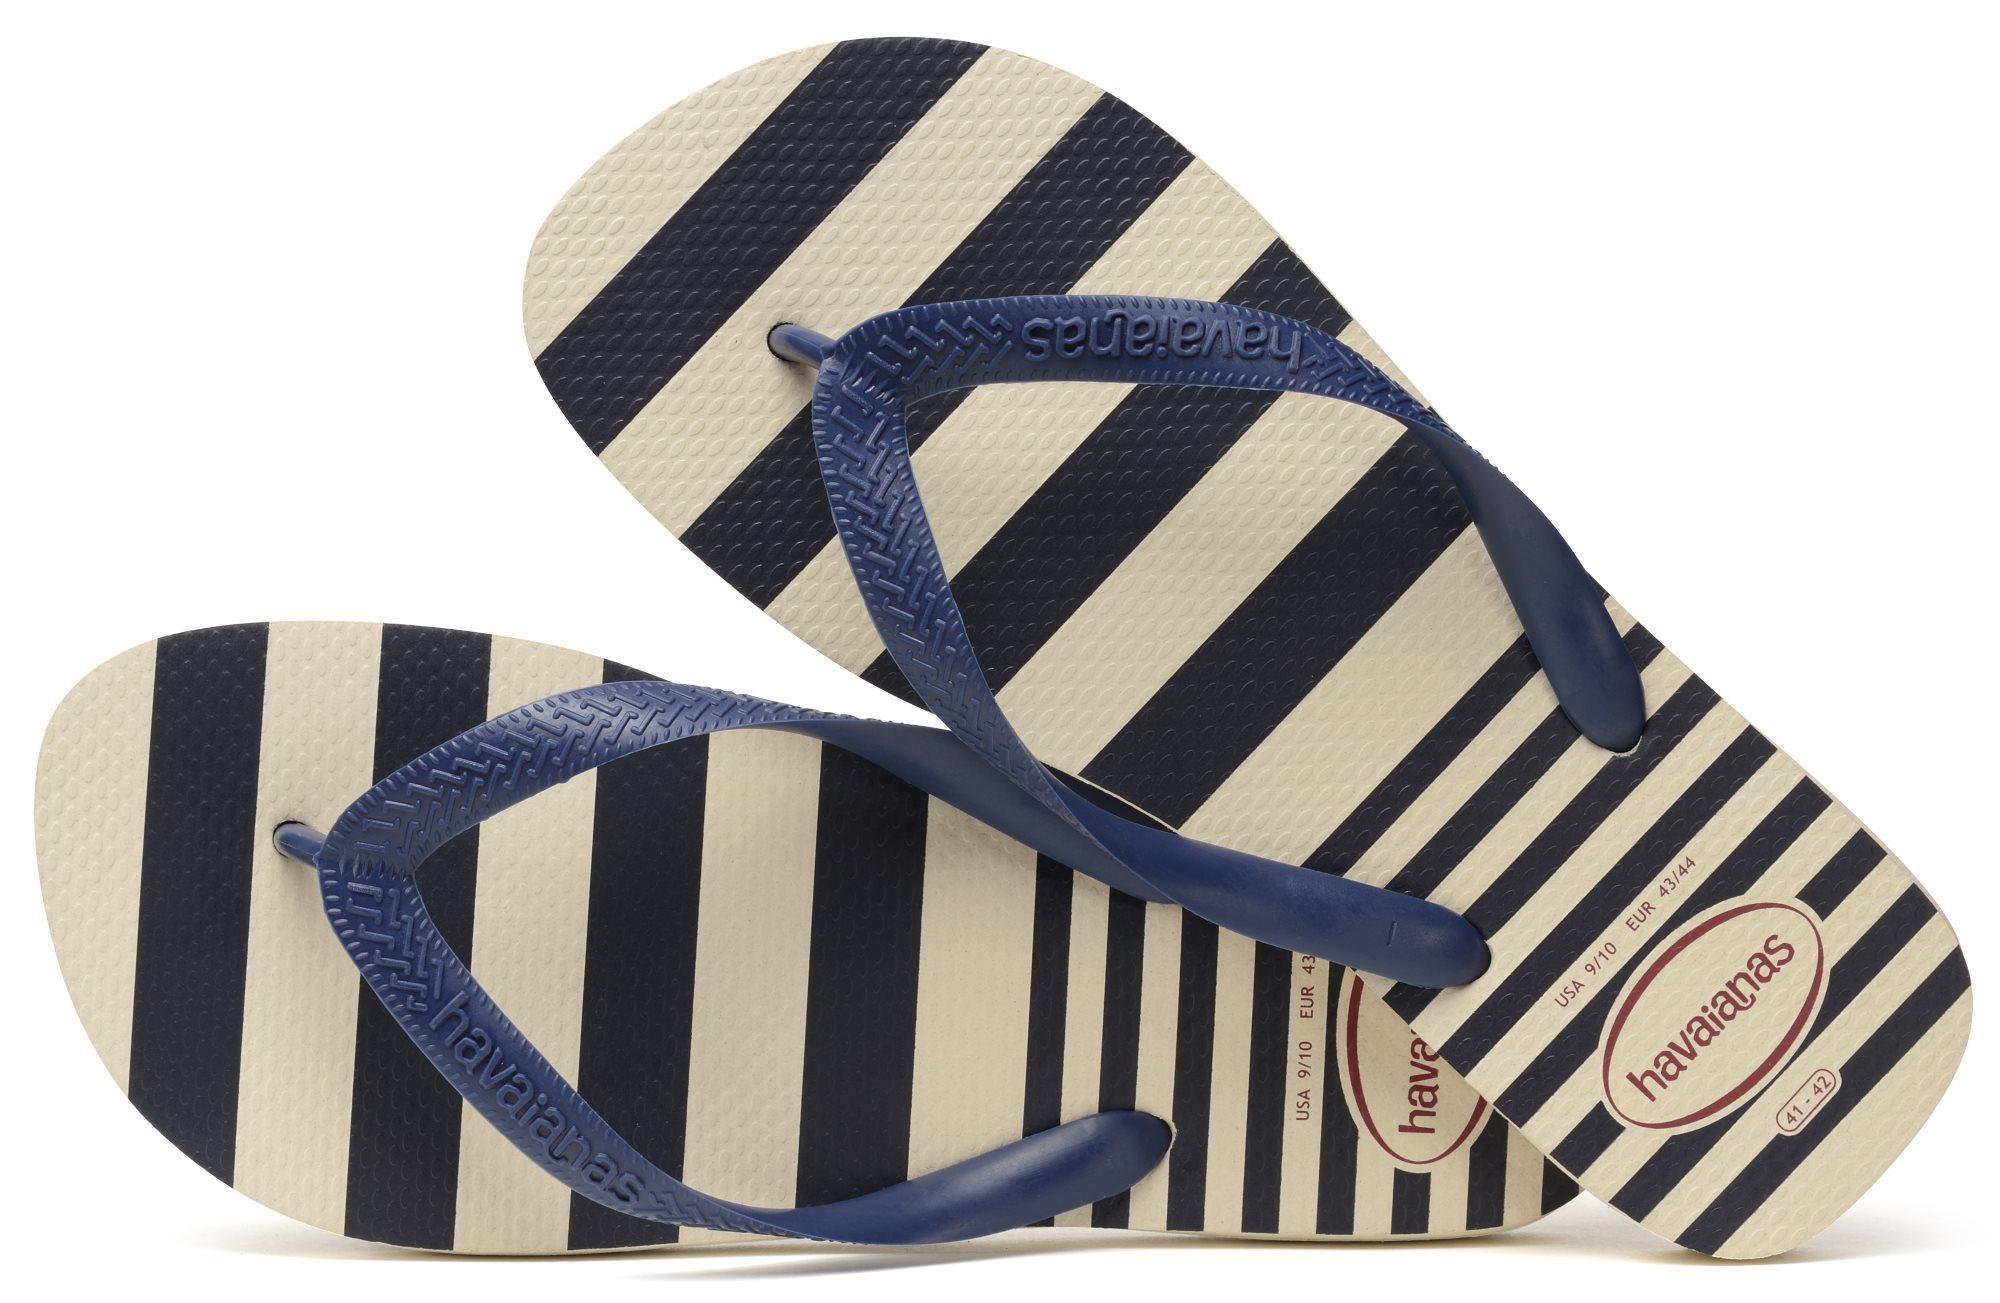 Infradito Havaianas Top Retro beige sandali uomo 41401770121